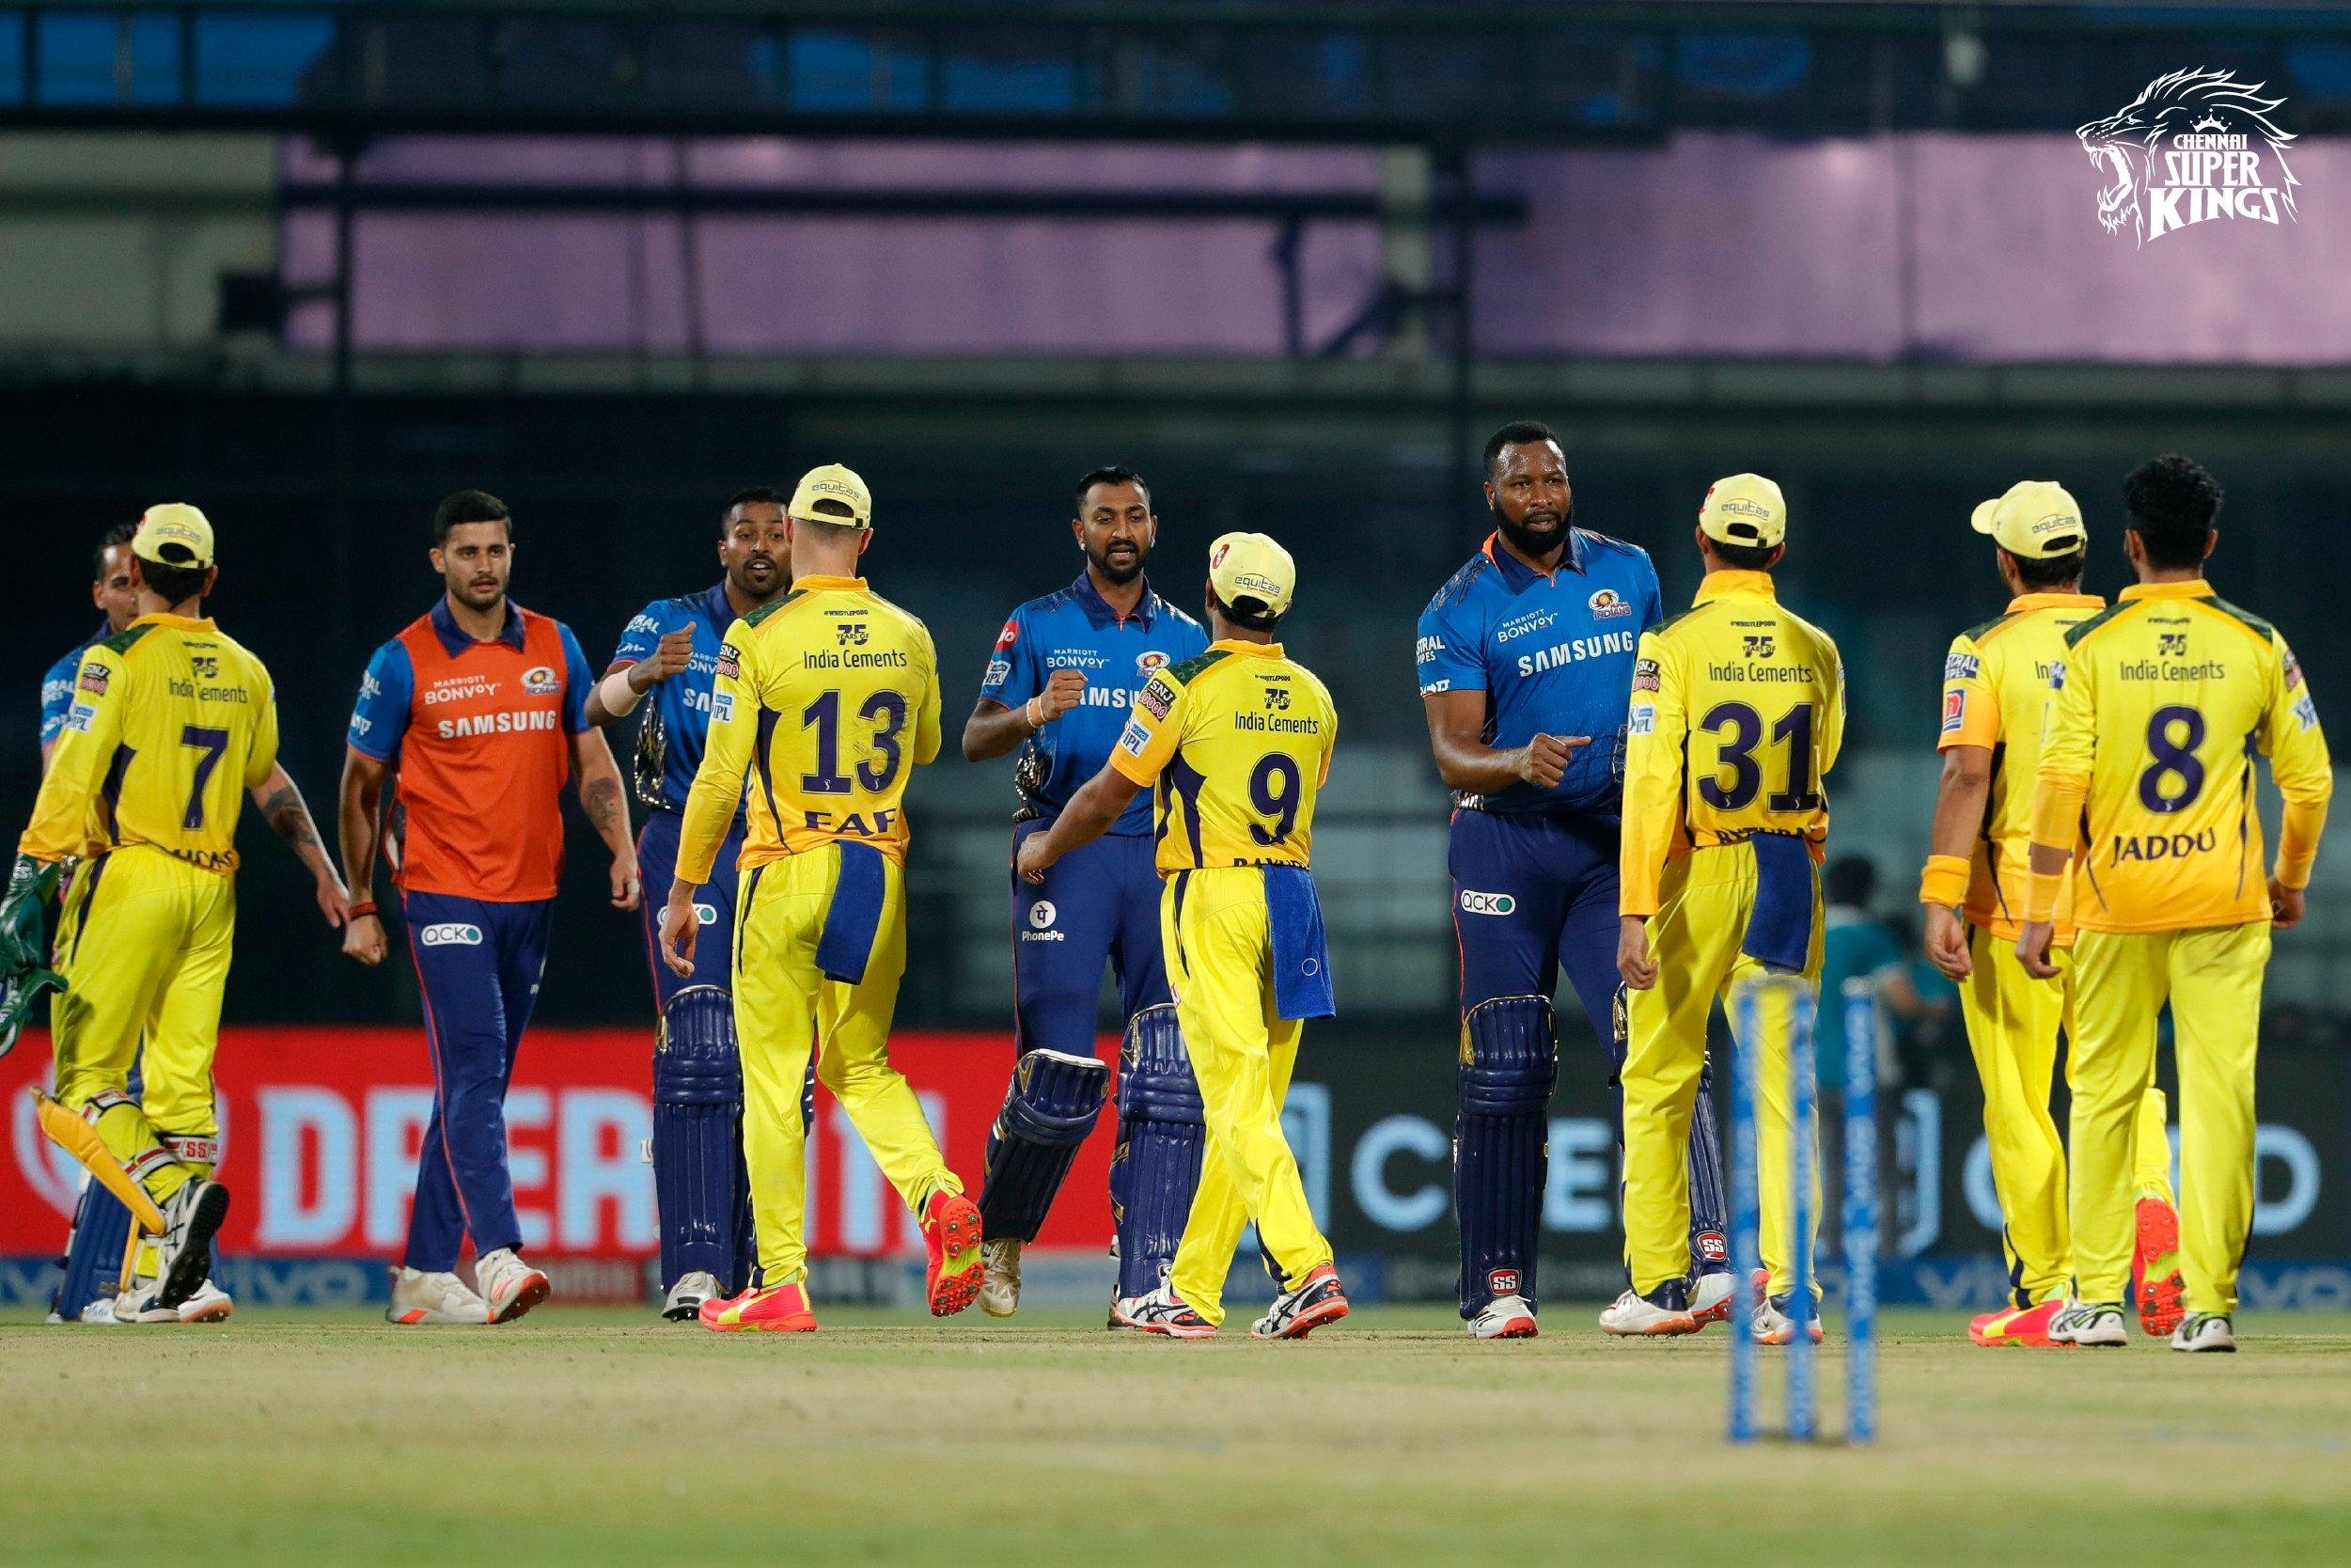 IPL 2021 CSK vs MI